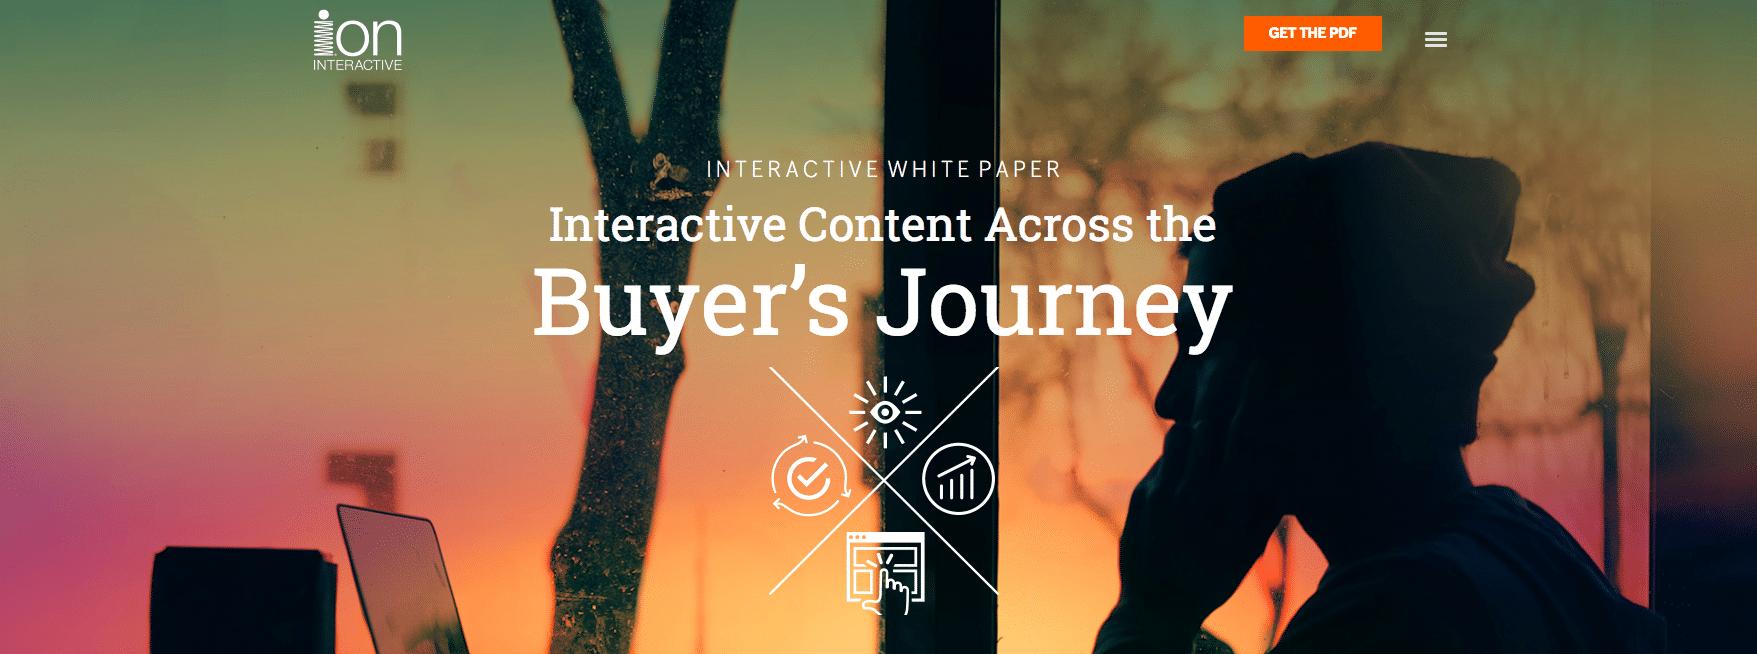 Interactive content - white paper